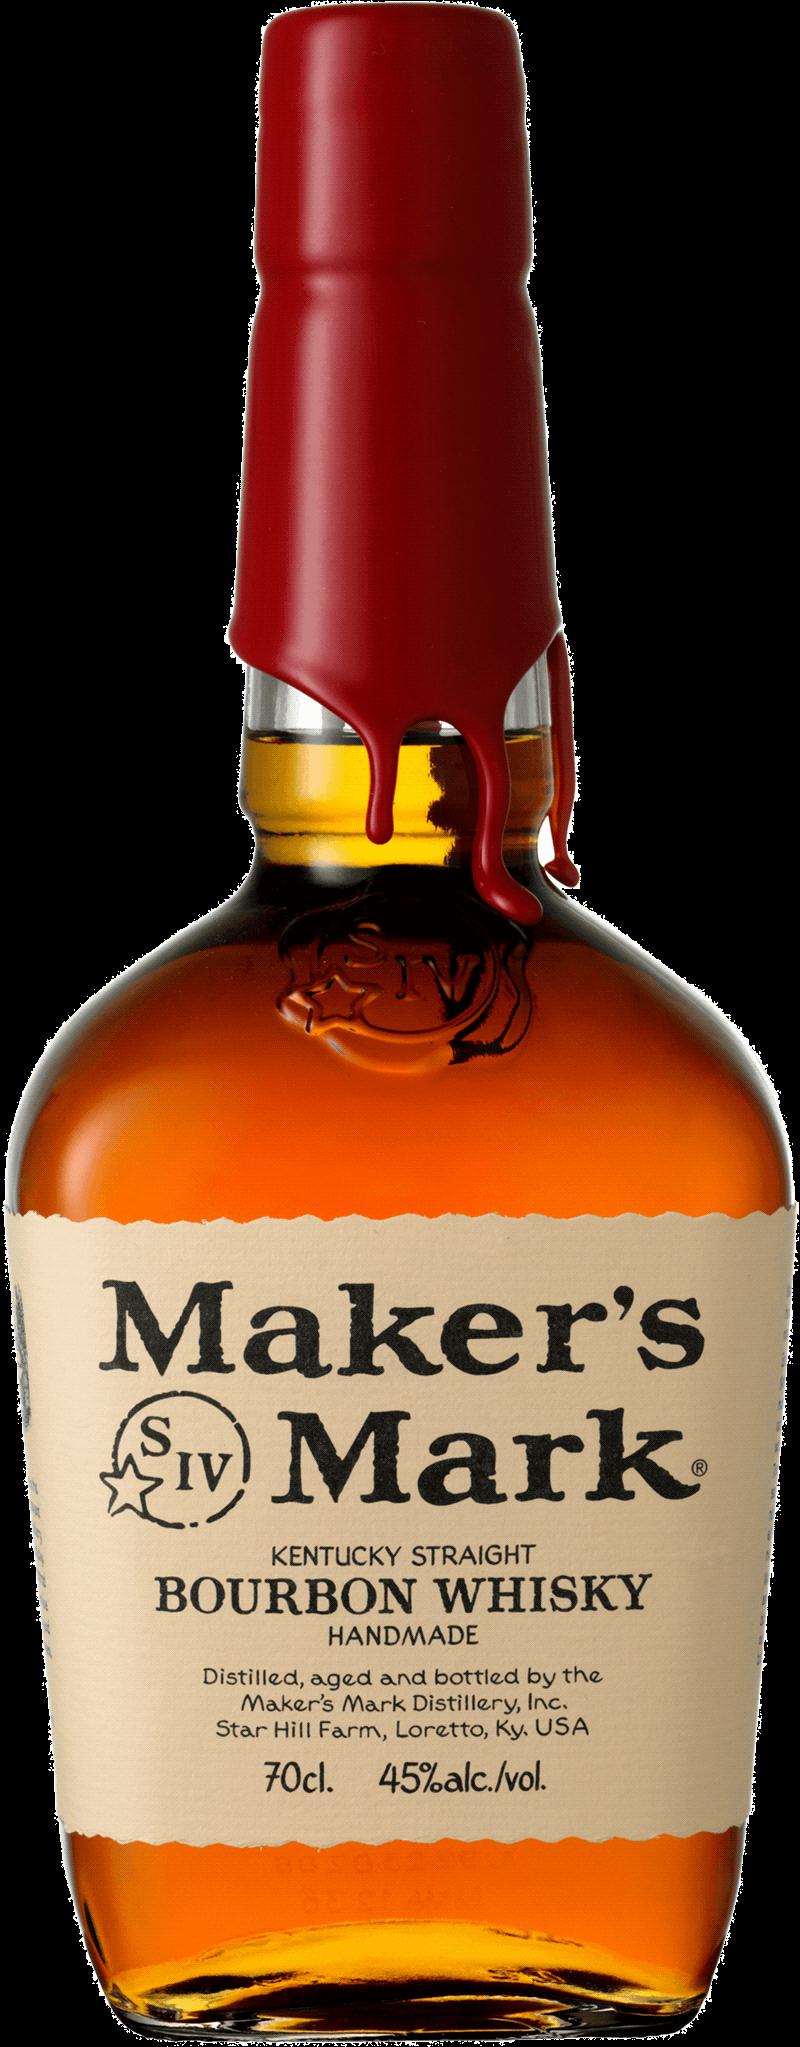 Maker's Mark . En Whisky av typen Bourbon i en 700 Flaska från Kentucky